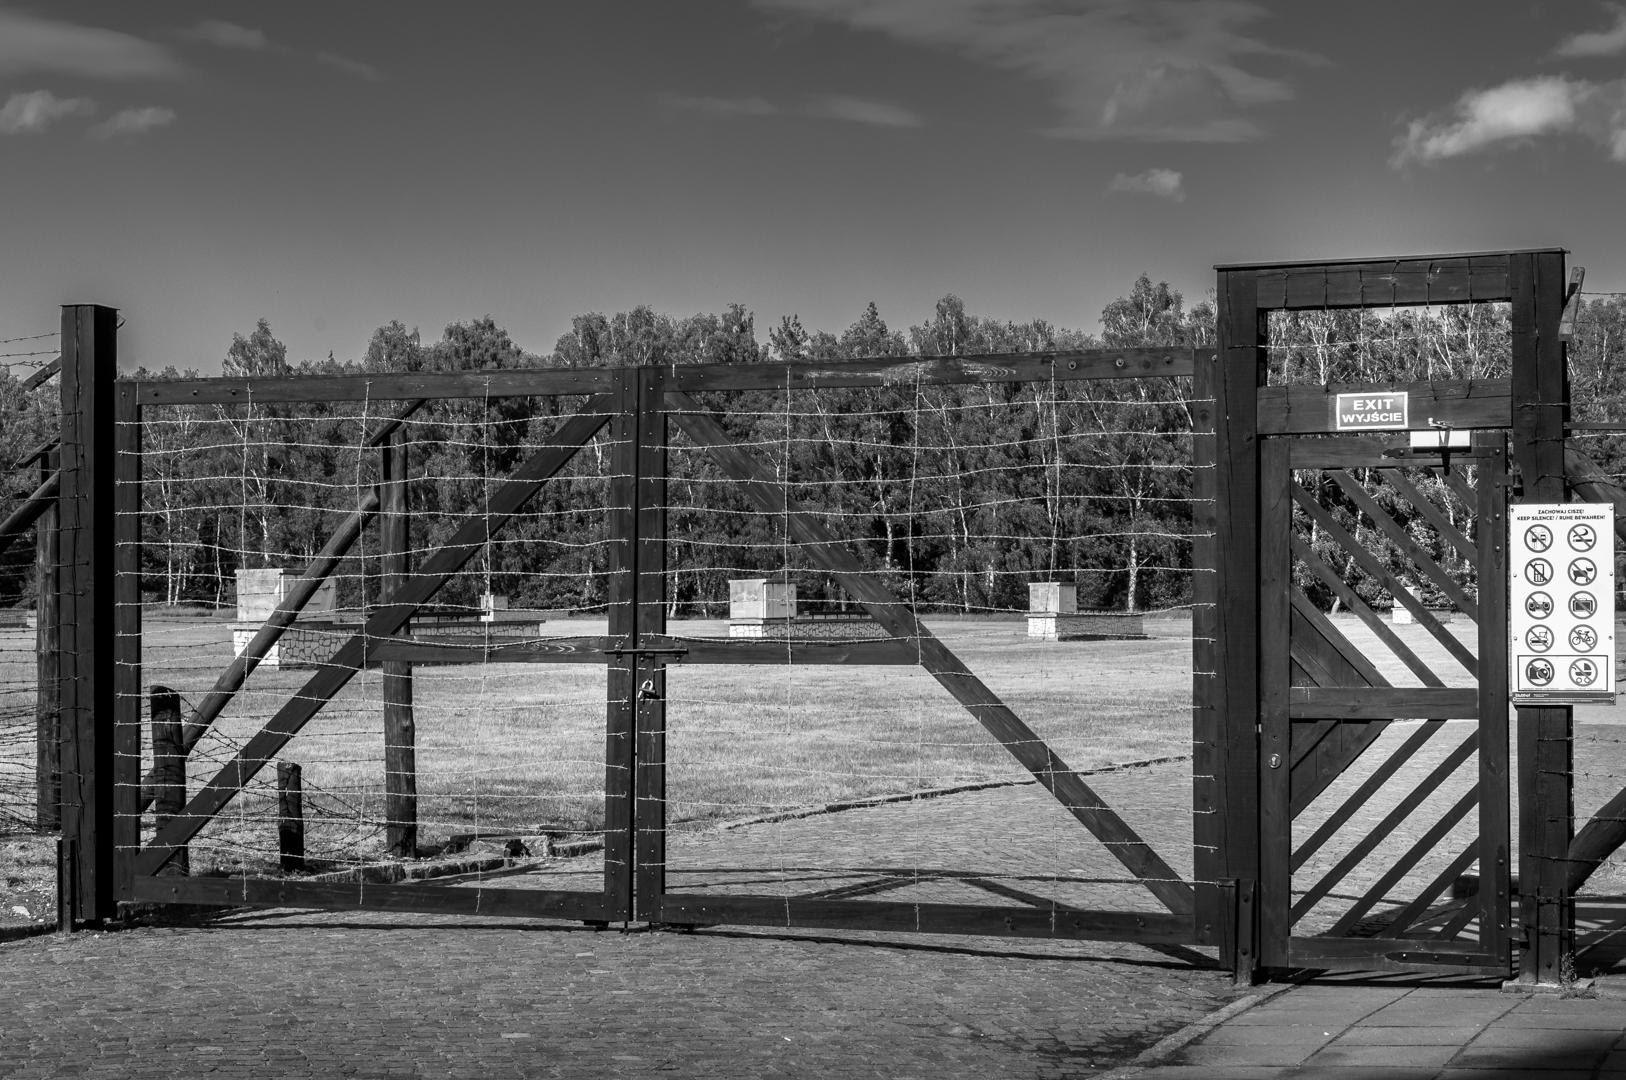 Stuthoff German Camp-170612-0471.jpg